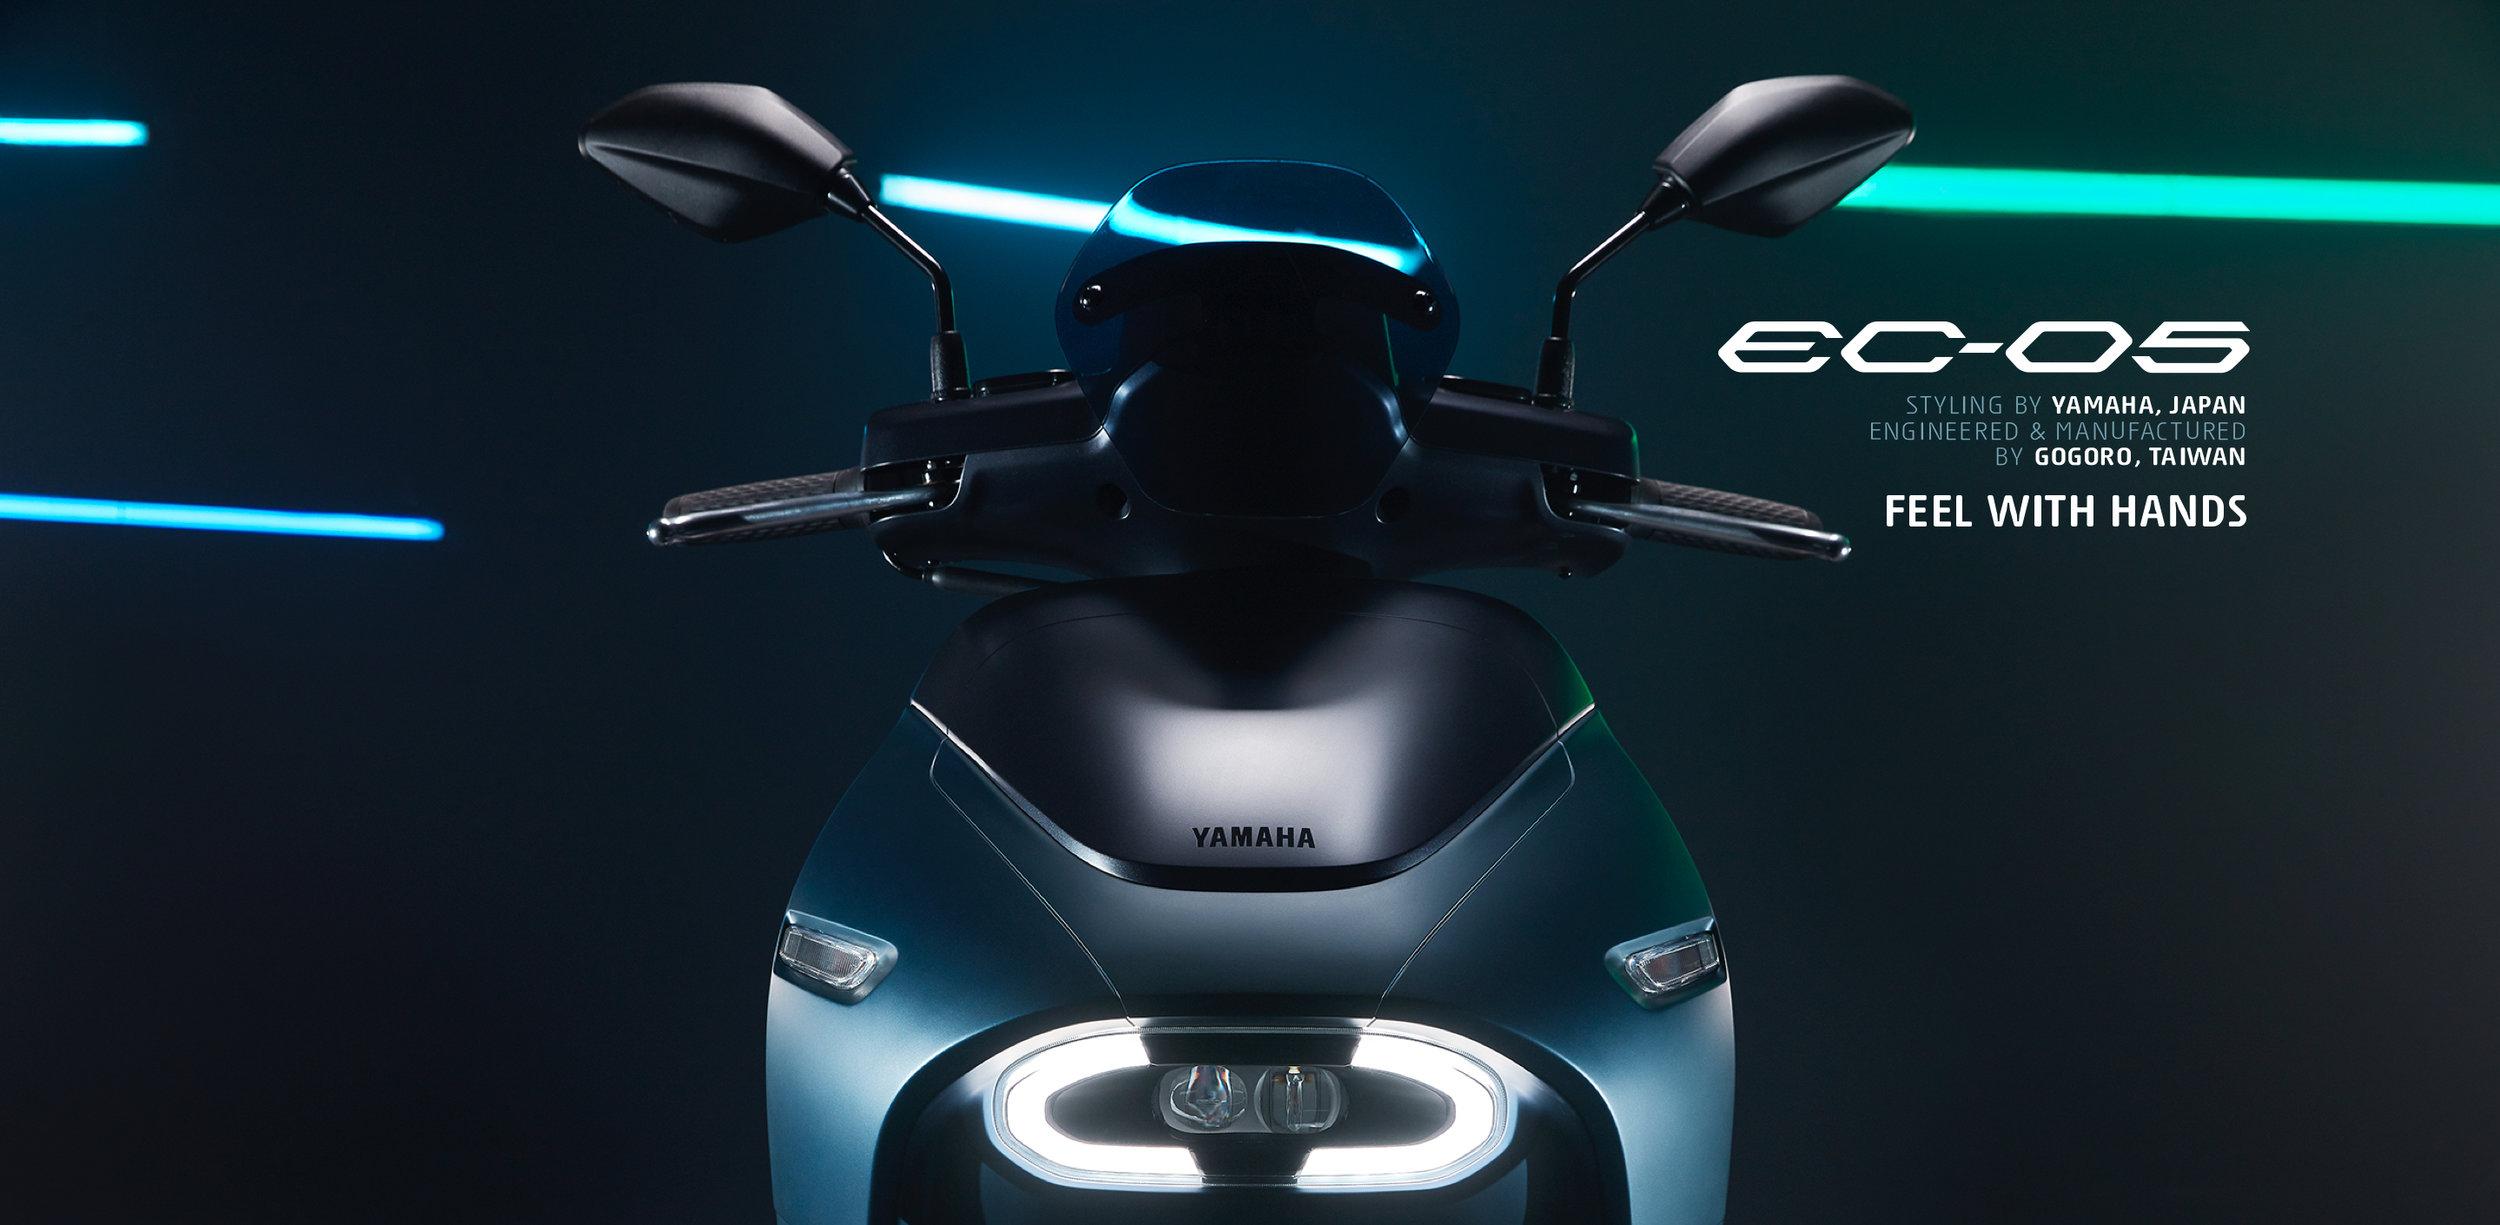 YAMAHA EC-05_01_請務必載明出處Provided by Yamaha Motor Co., Ltd.jpg